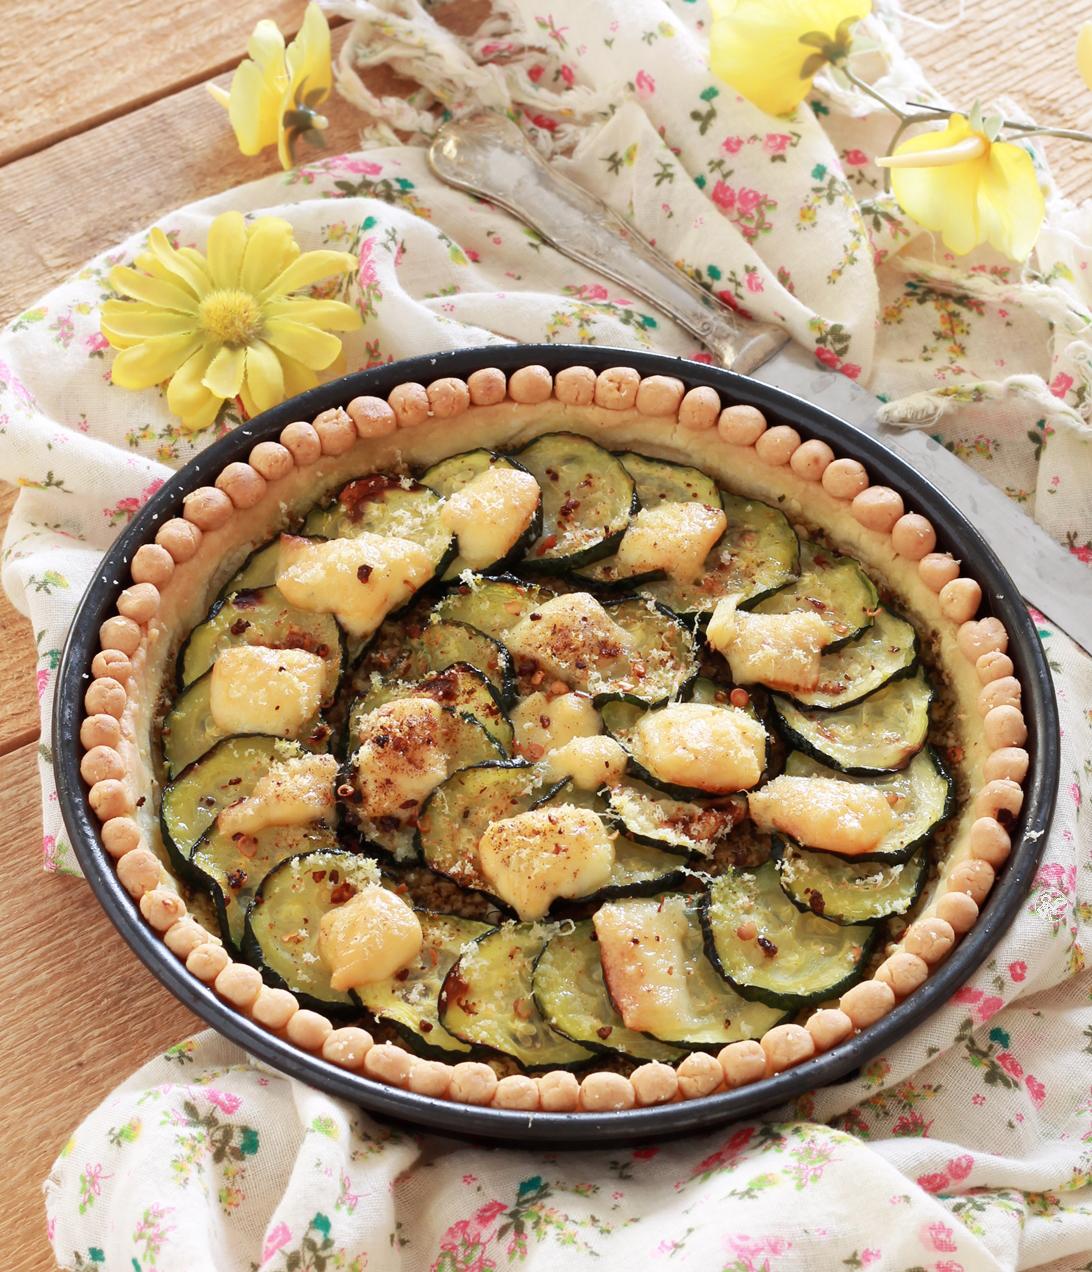 Torta di zucchine e pesto senza glutine - La Cassata Celiaca